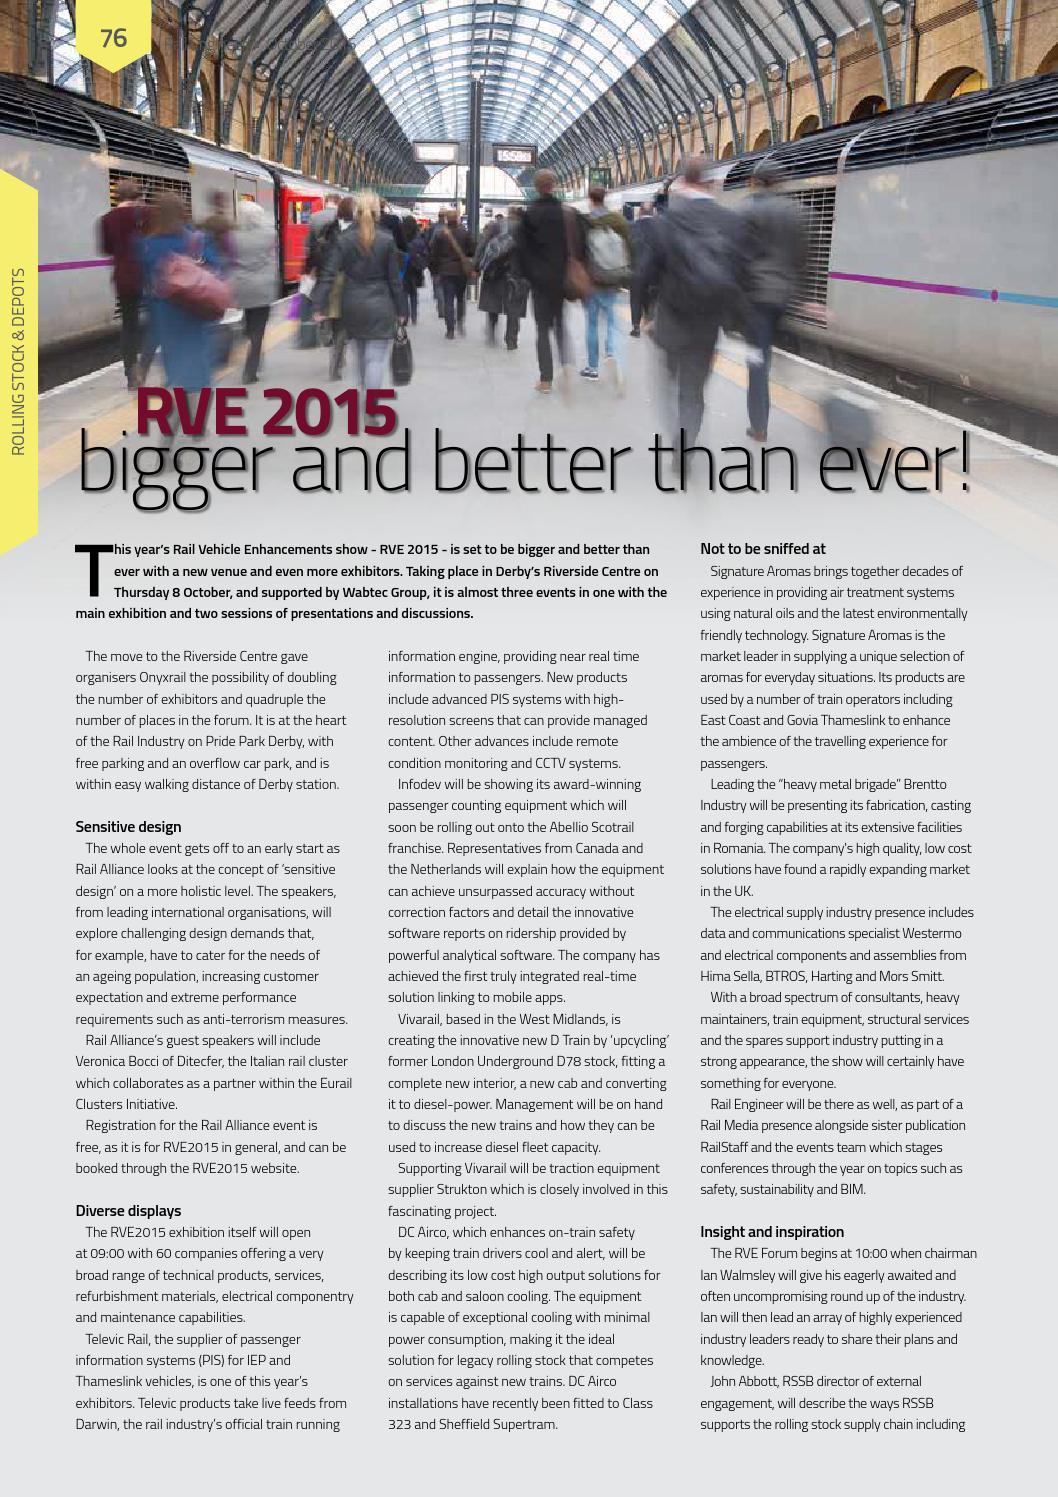 Rail Engineer - Issue 132 - October 2015 by Rail Media - issuu